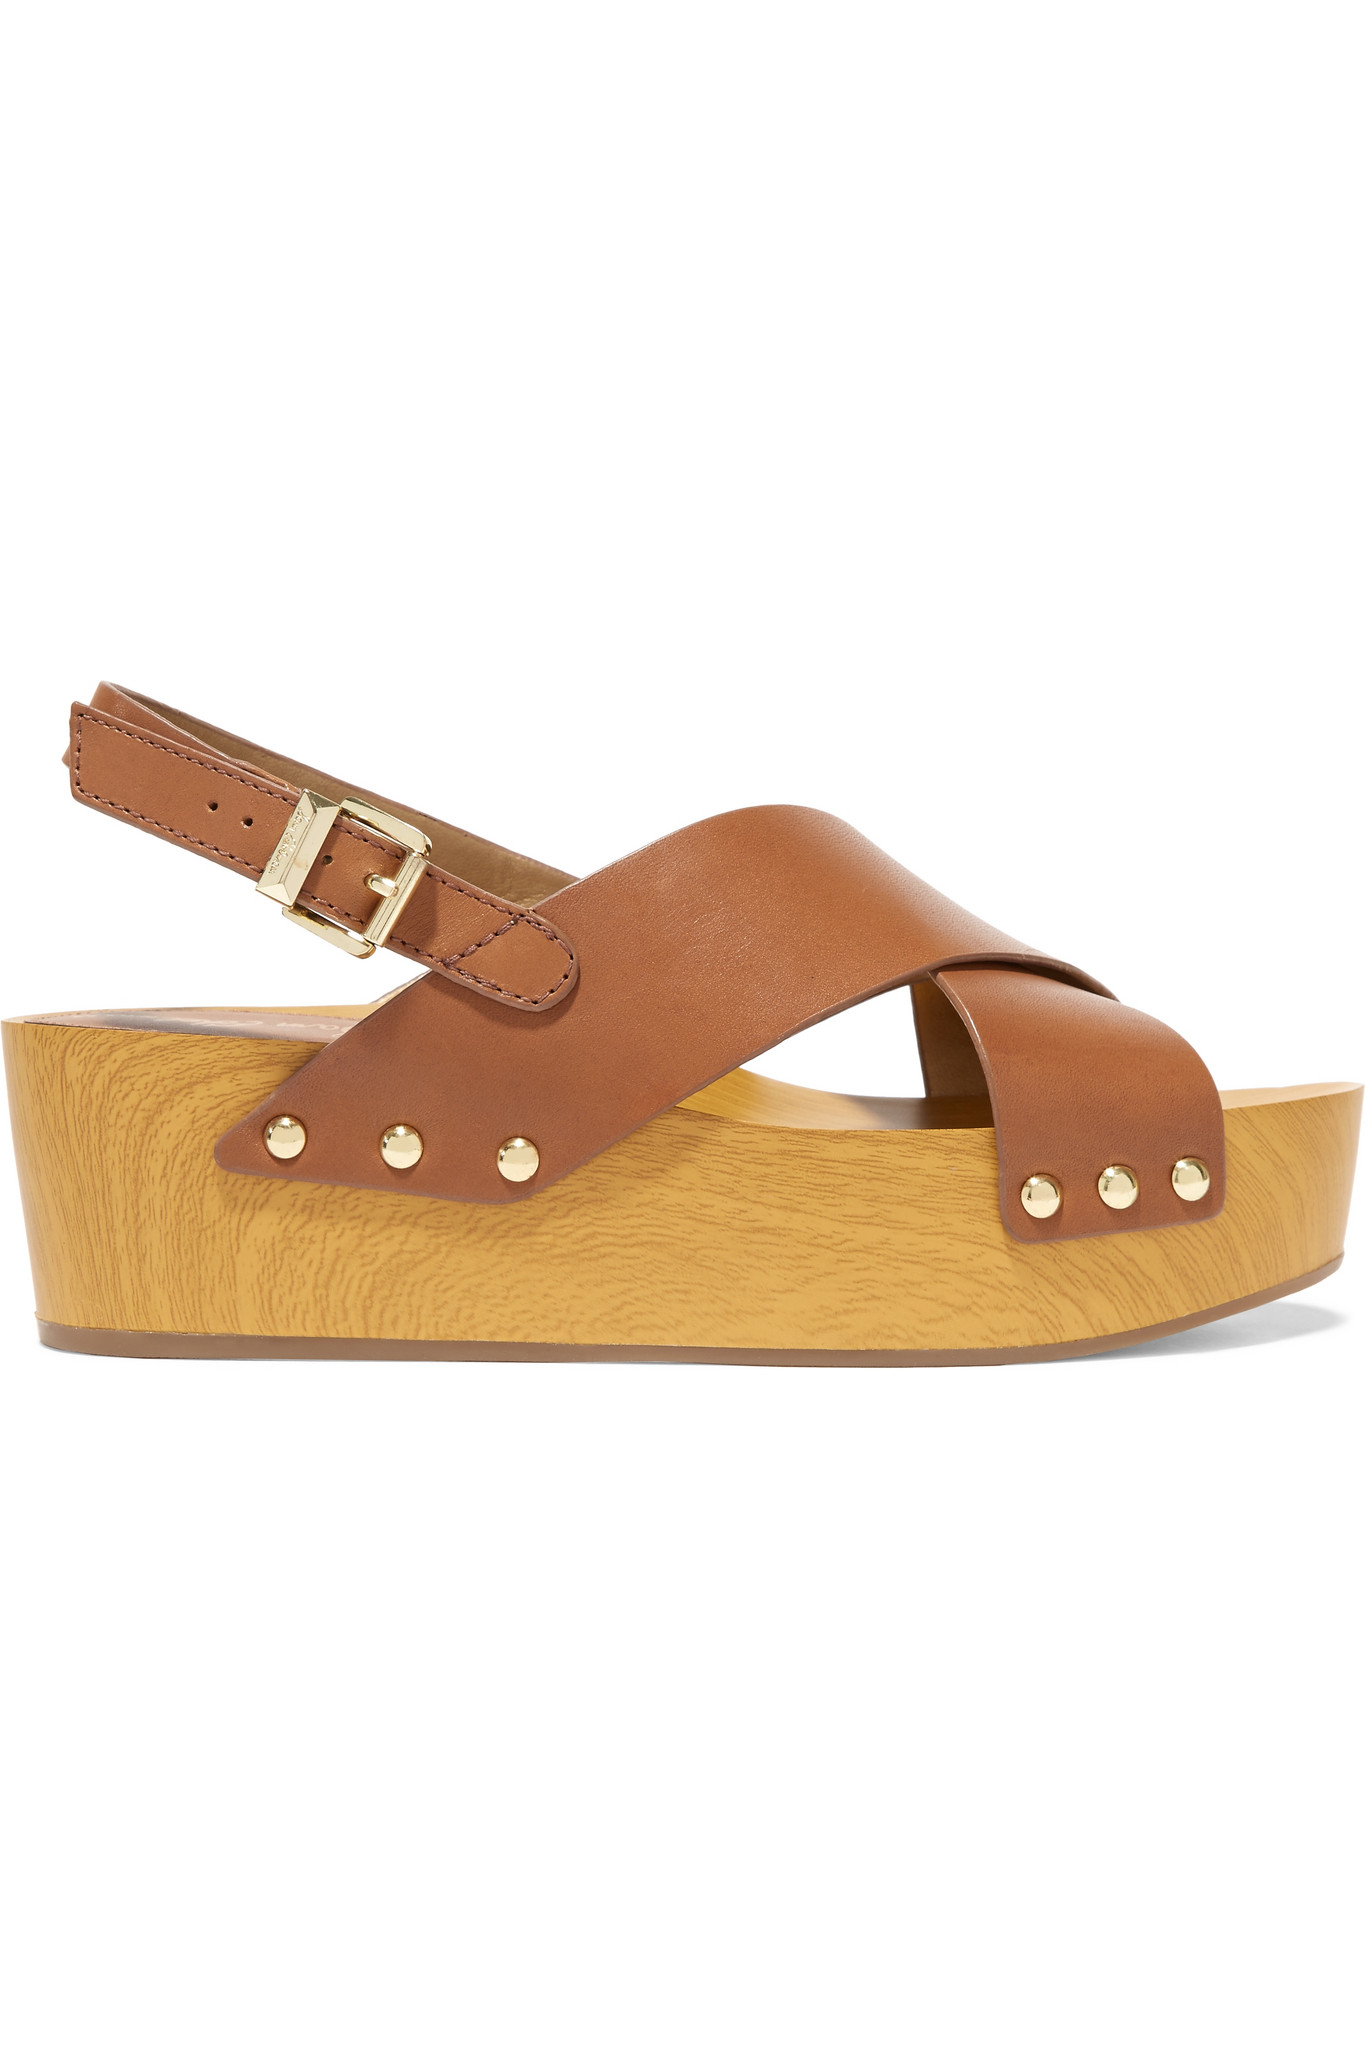 17228b0fe58 Lyst - Sam Edelman Bentlee Leather Platform Sandals in Brown